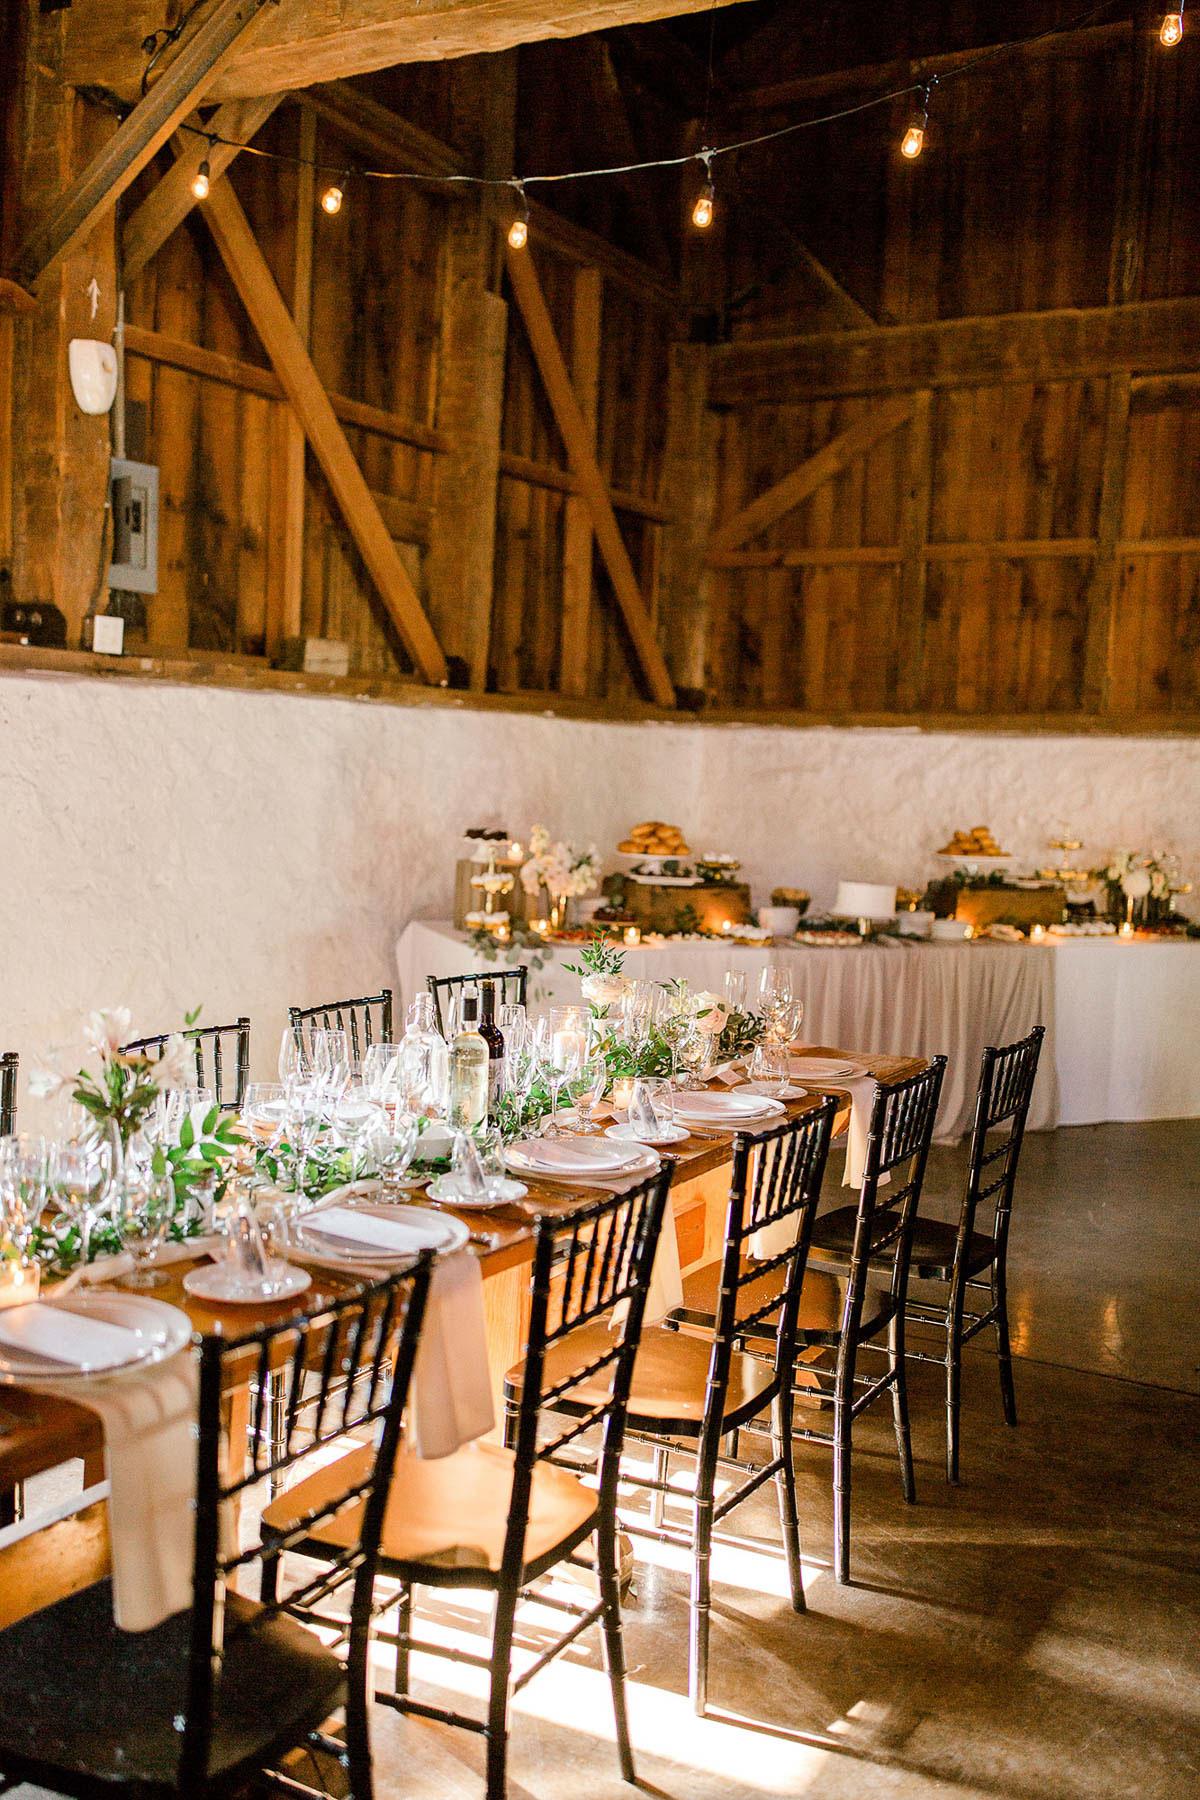 beatrice-elford-photography-vineyard-bride-swish-list-balls-falls-vineland-wedding-62.jpg